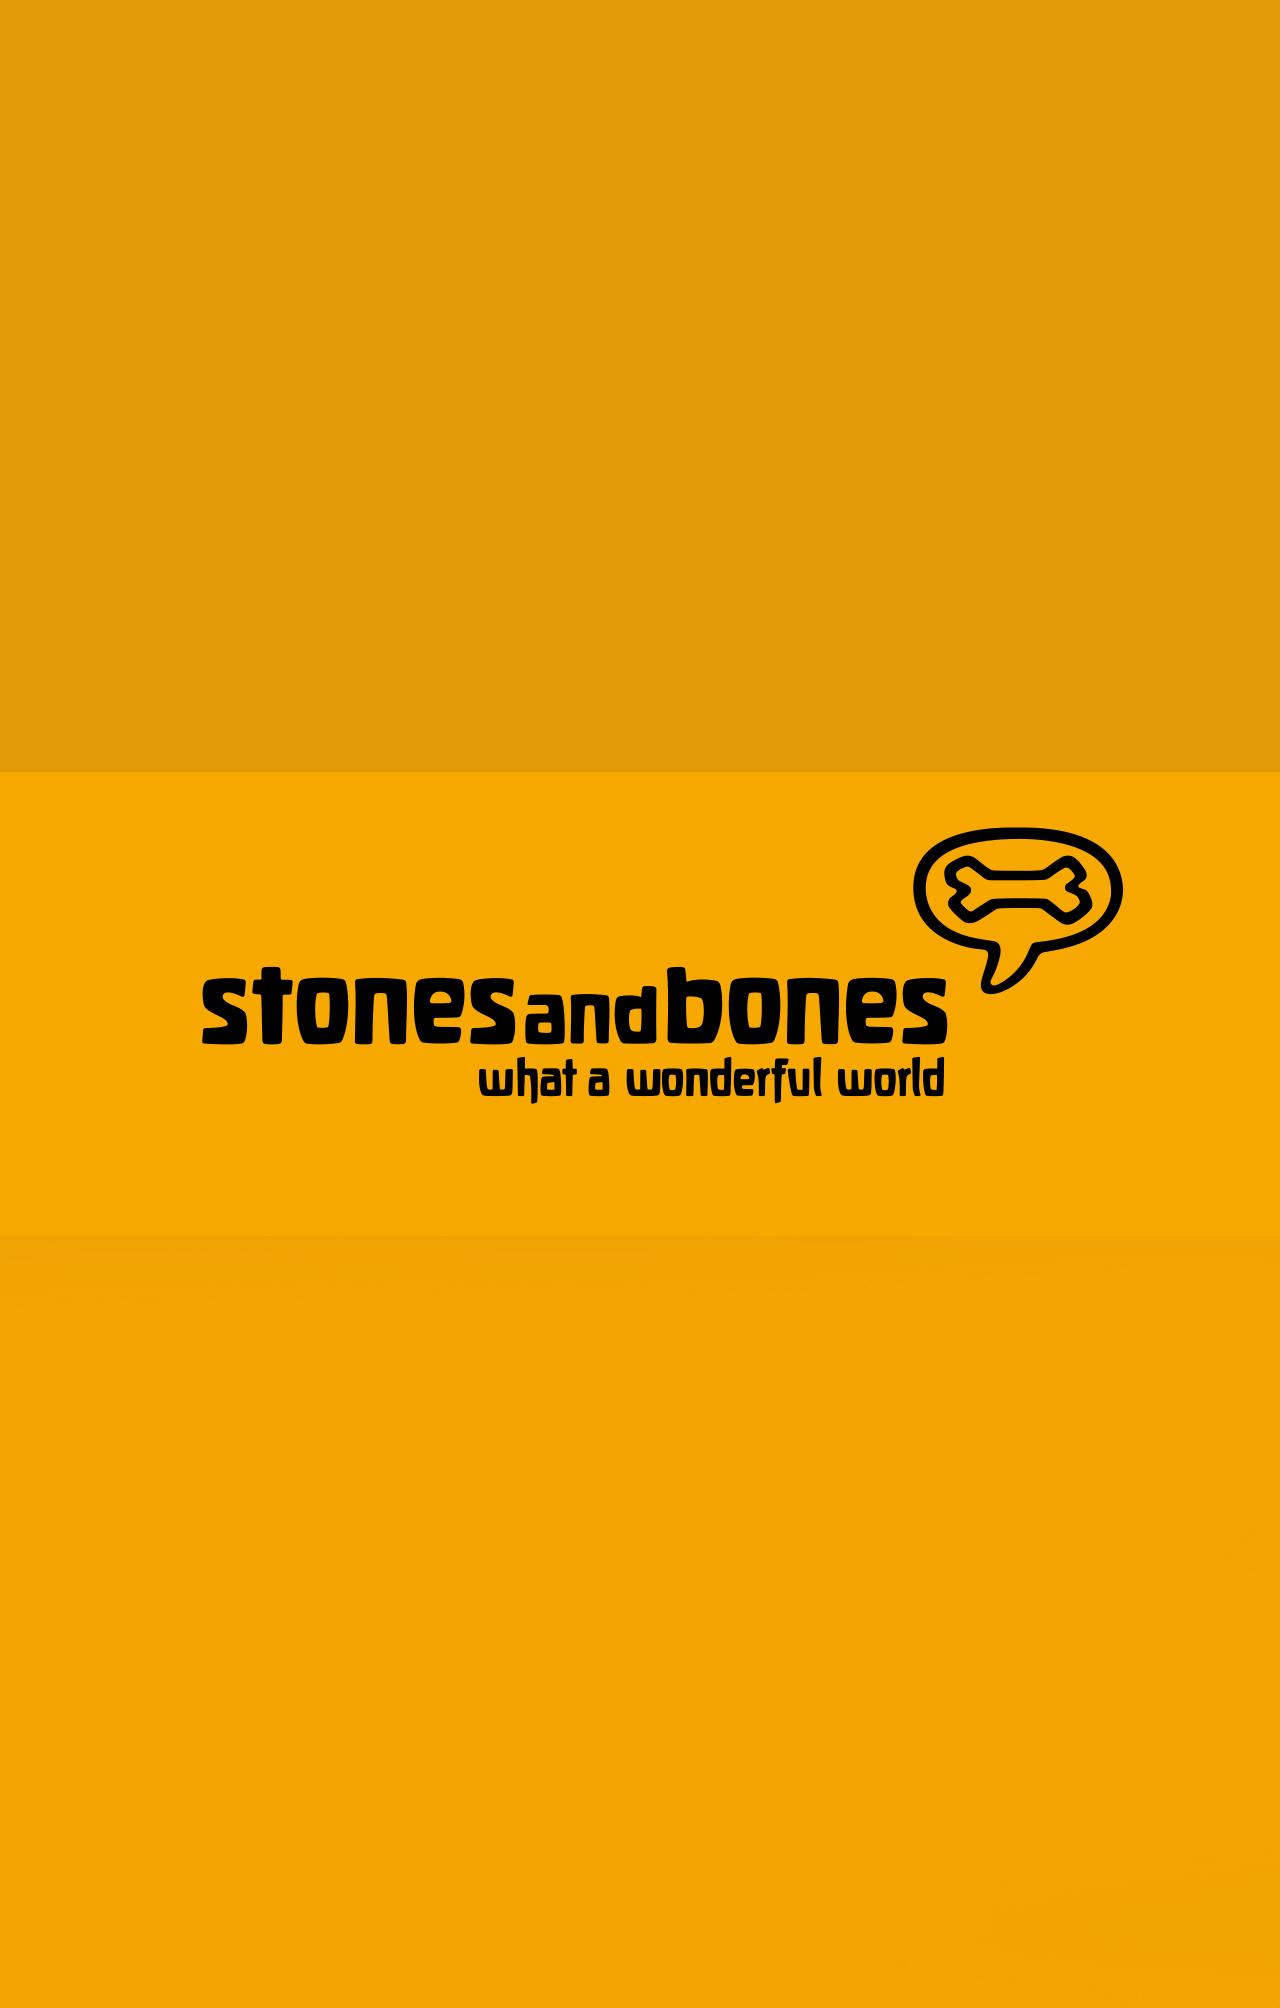 STONES-AND-BONES-nieuwe-baseline